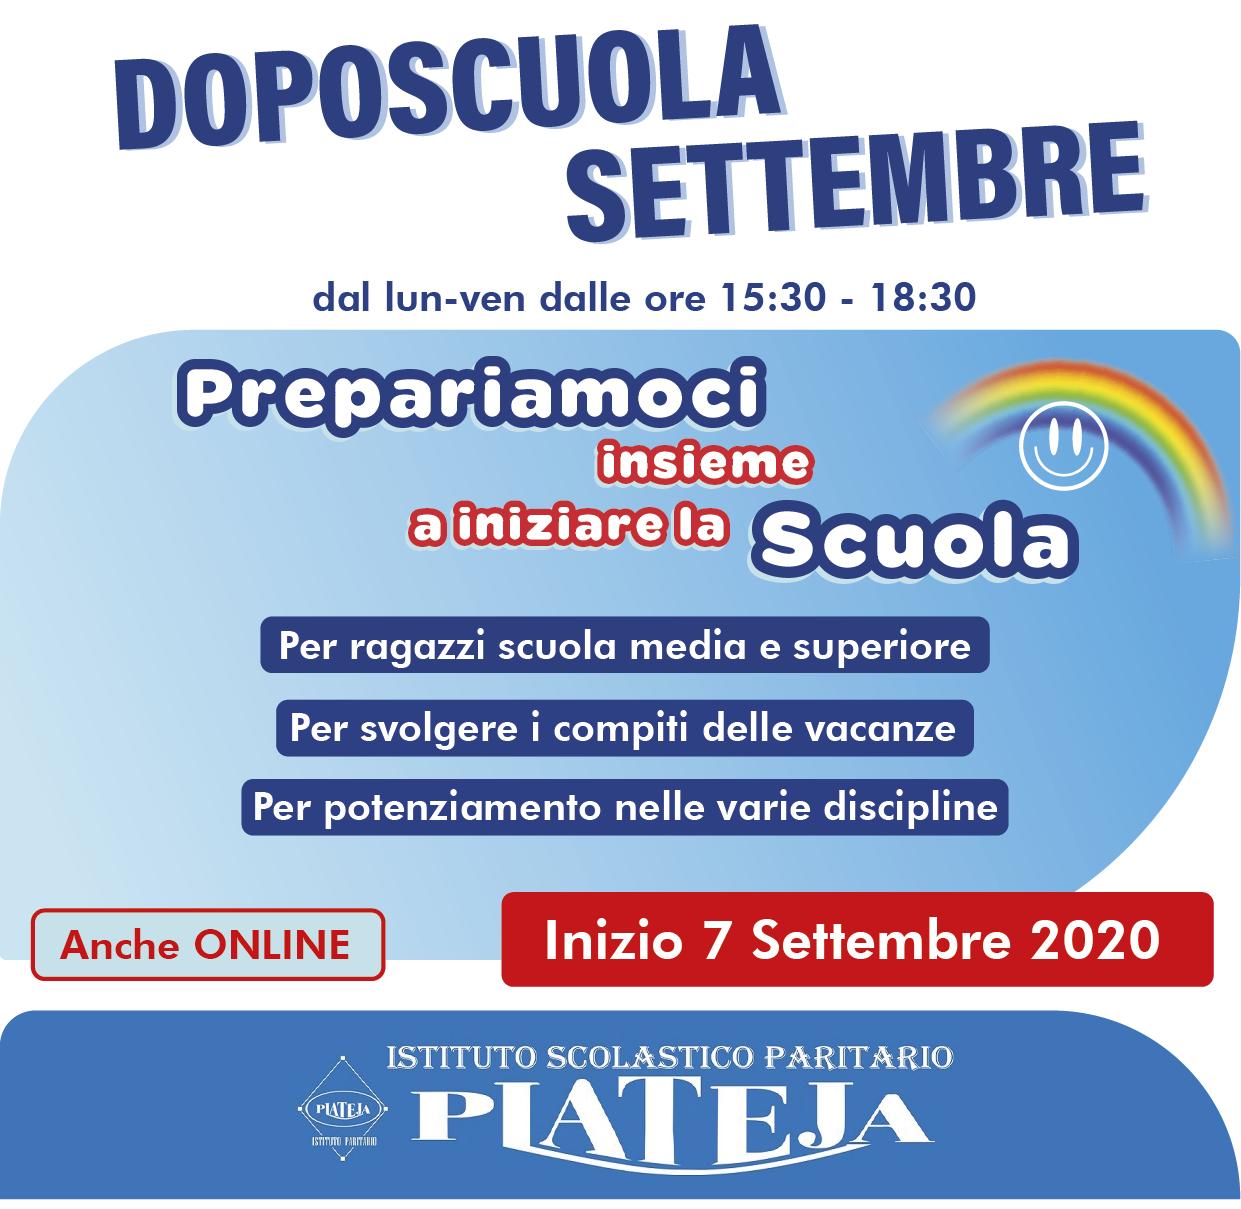 post doposcuola